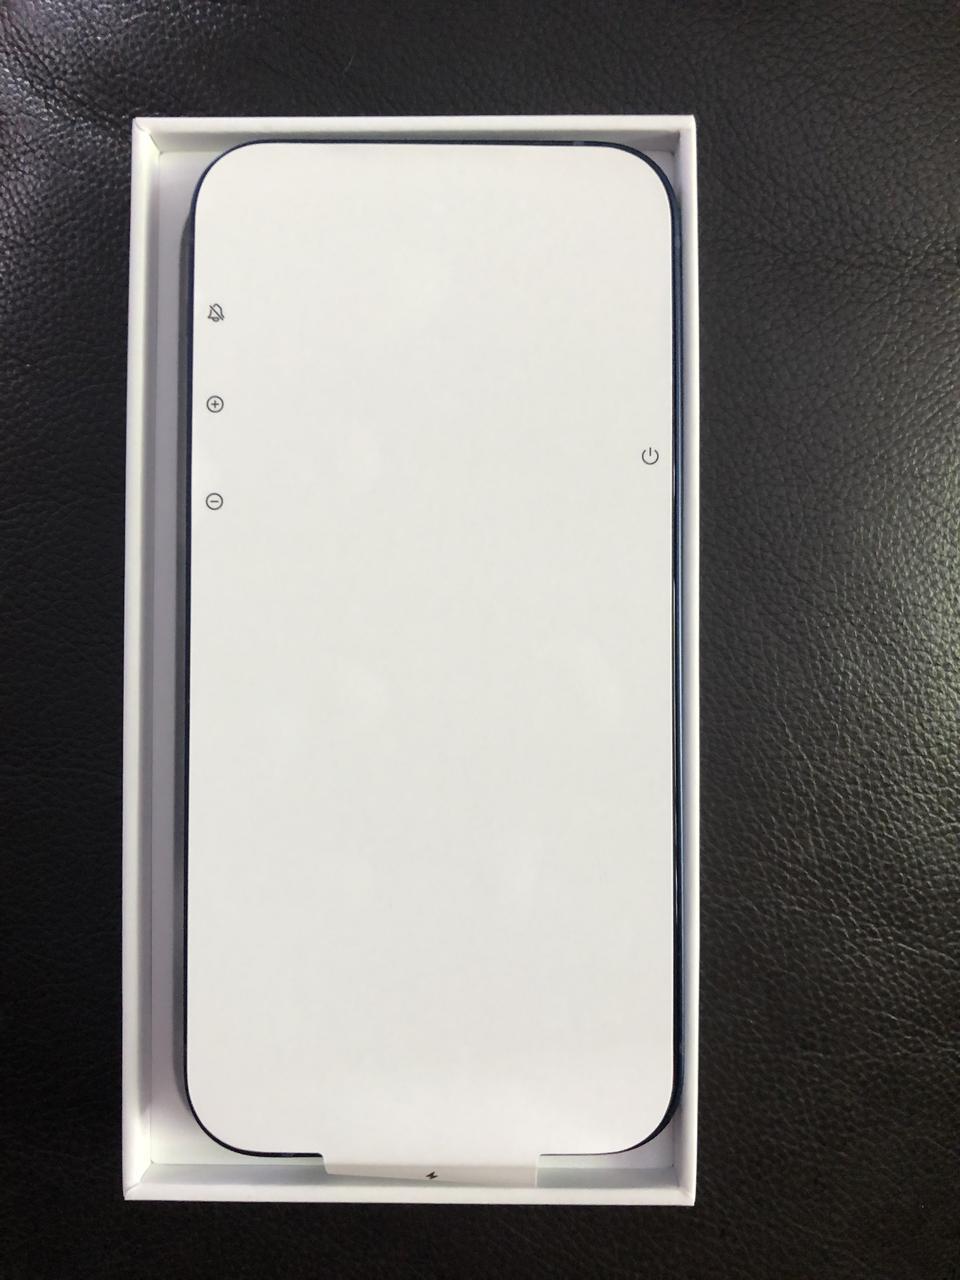 Iphone 12 256 gb สีน้ำเงิน แท้ ของใหม่  รูปที่ 3